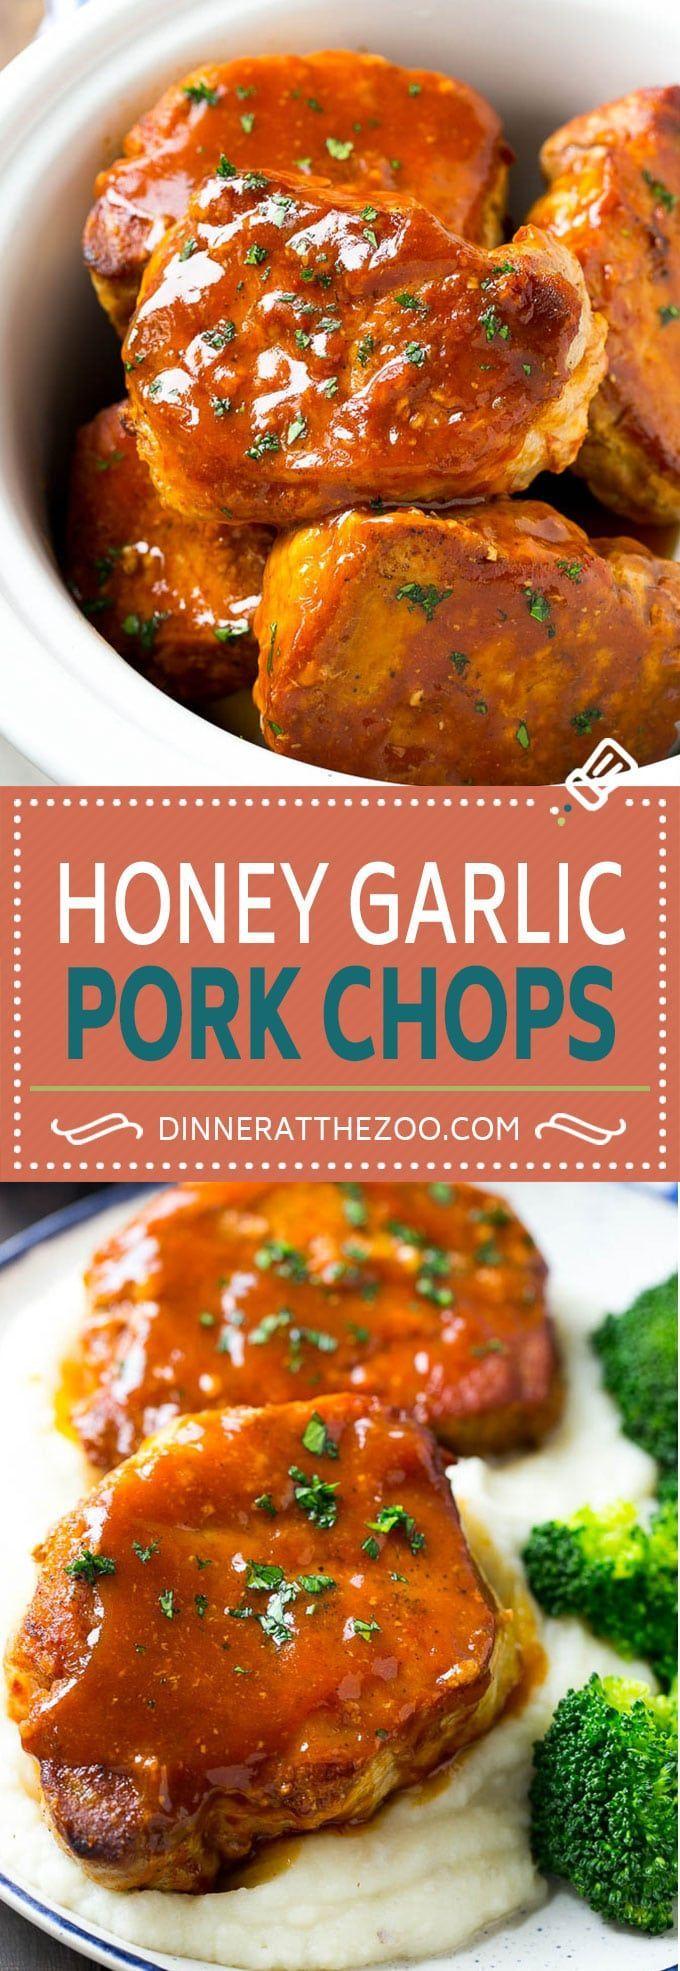 Honey Garlic Pork Chops Recipe | Slow Cooker Pork Chops | Crock Pot Pork Chops | Boneless Pork Chops Recipe